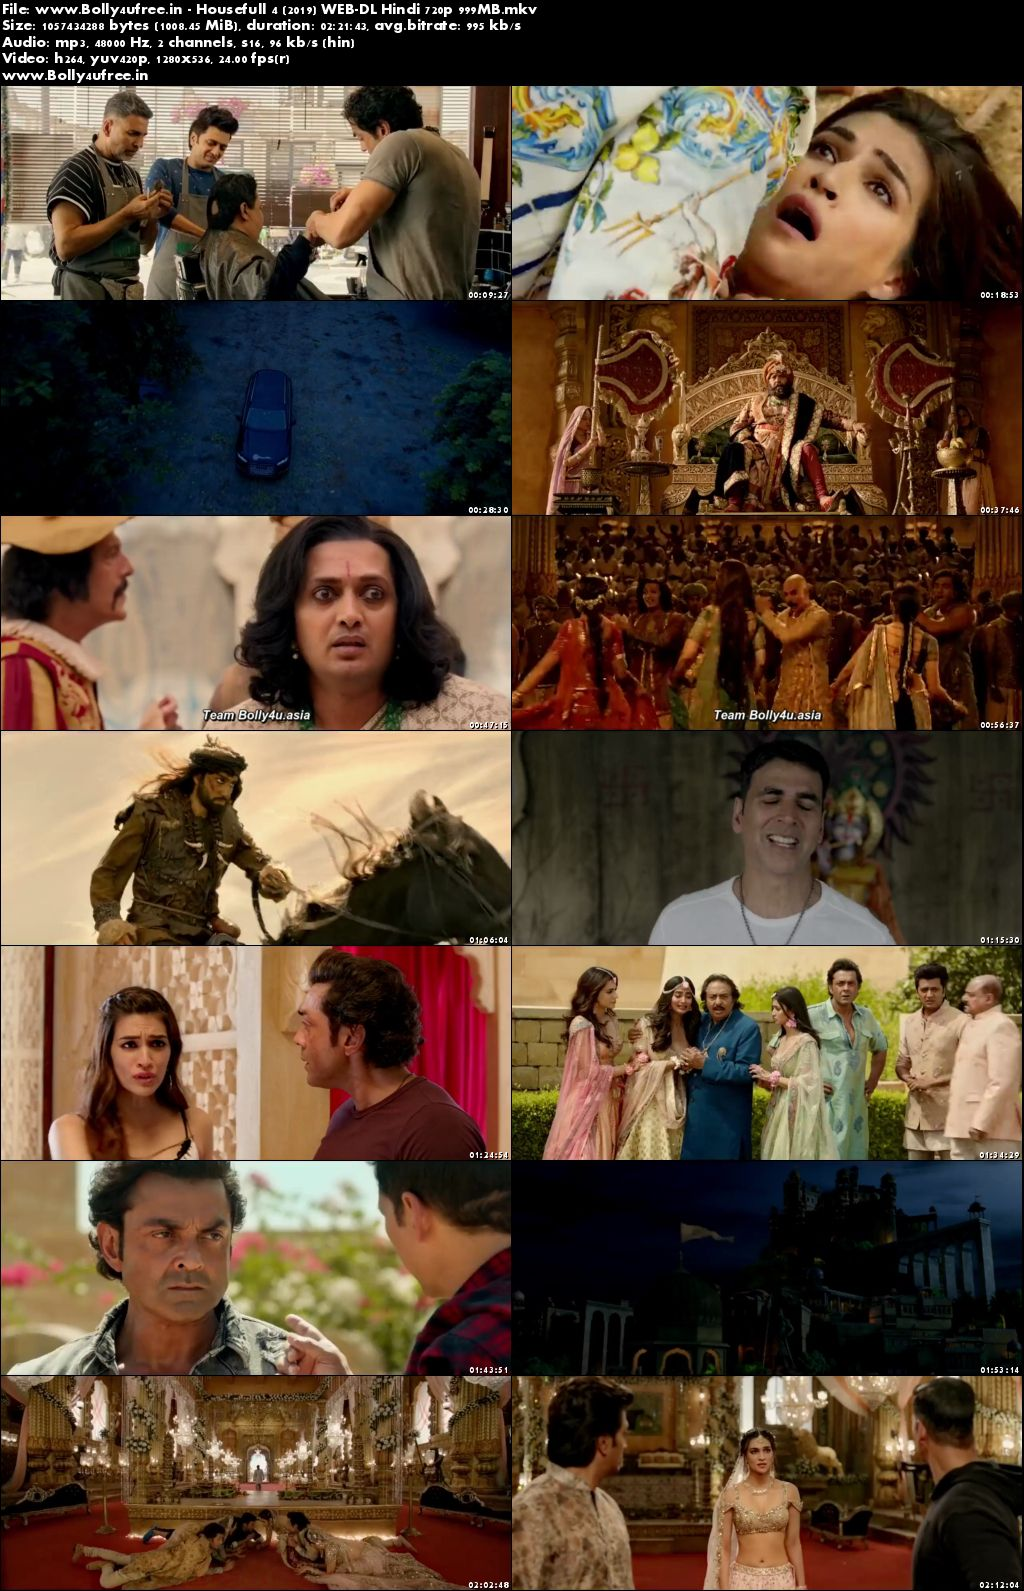 Housefull 4 2019 WEB-DL Hindi Movie Download 480p 400MB